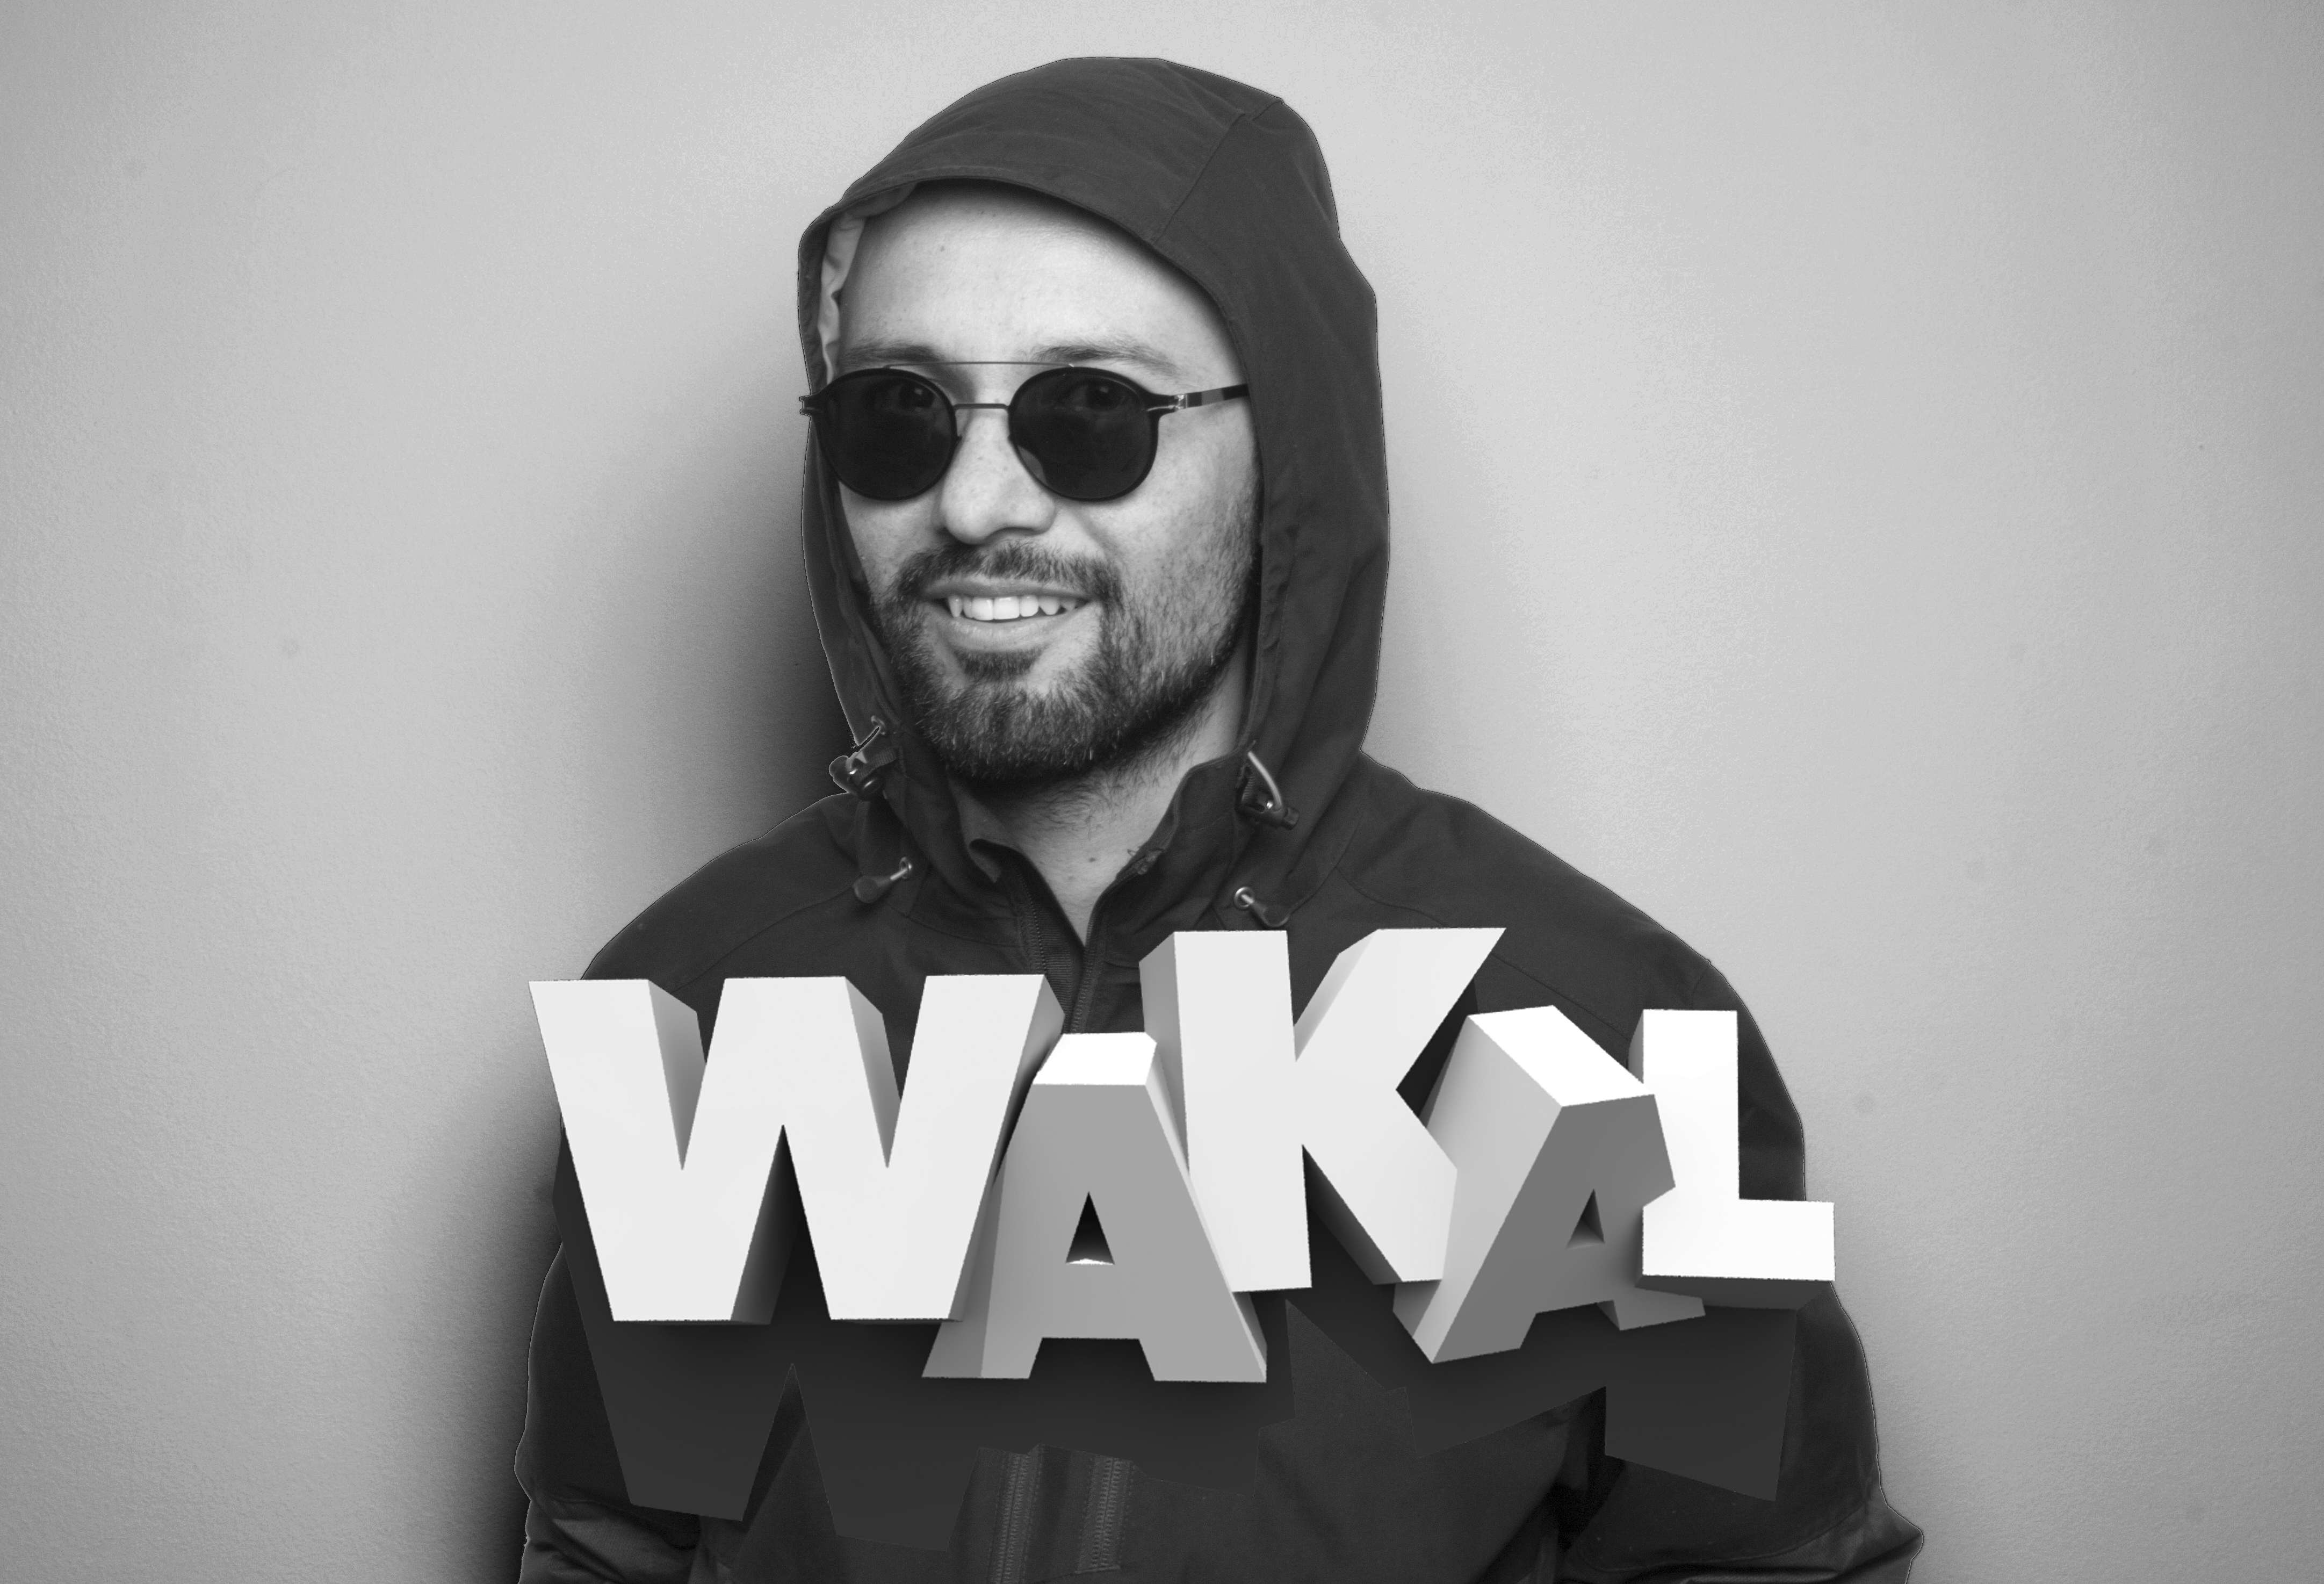 wakal